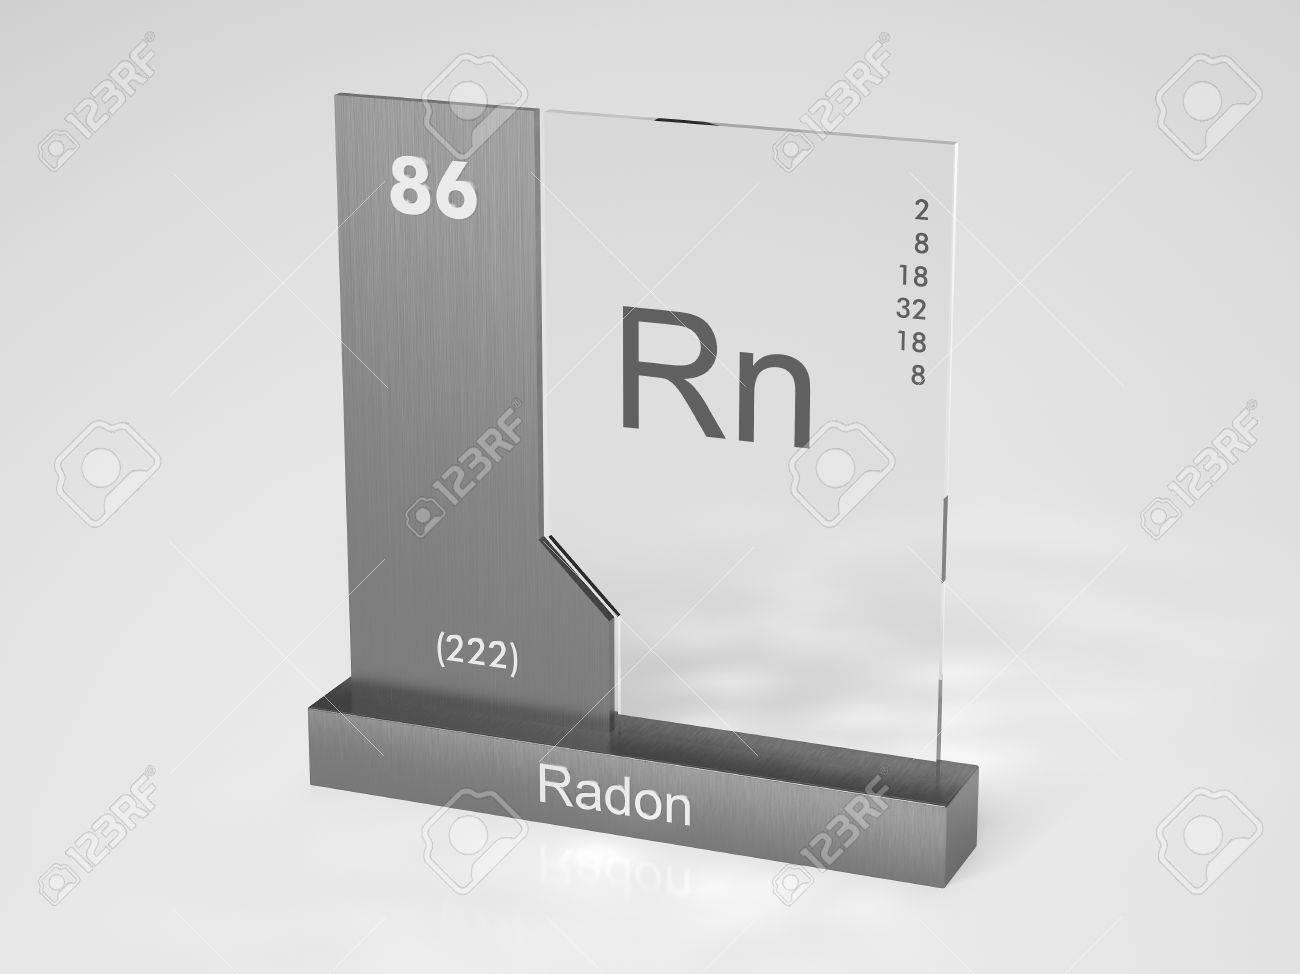 Radon symbol rn chemical element of the periodic table stock radon symbol rn chemical element of the periodic table stock photo 11255899 buycottarizona